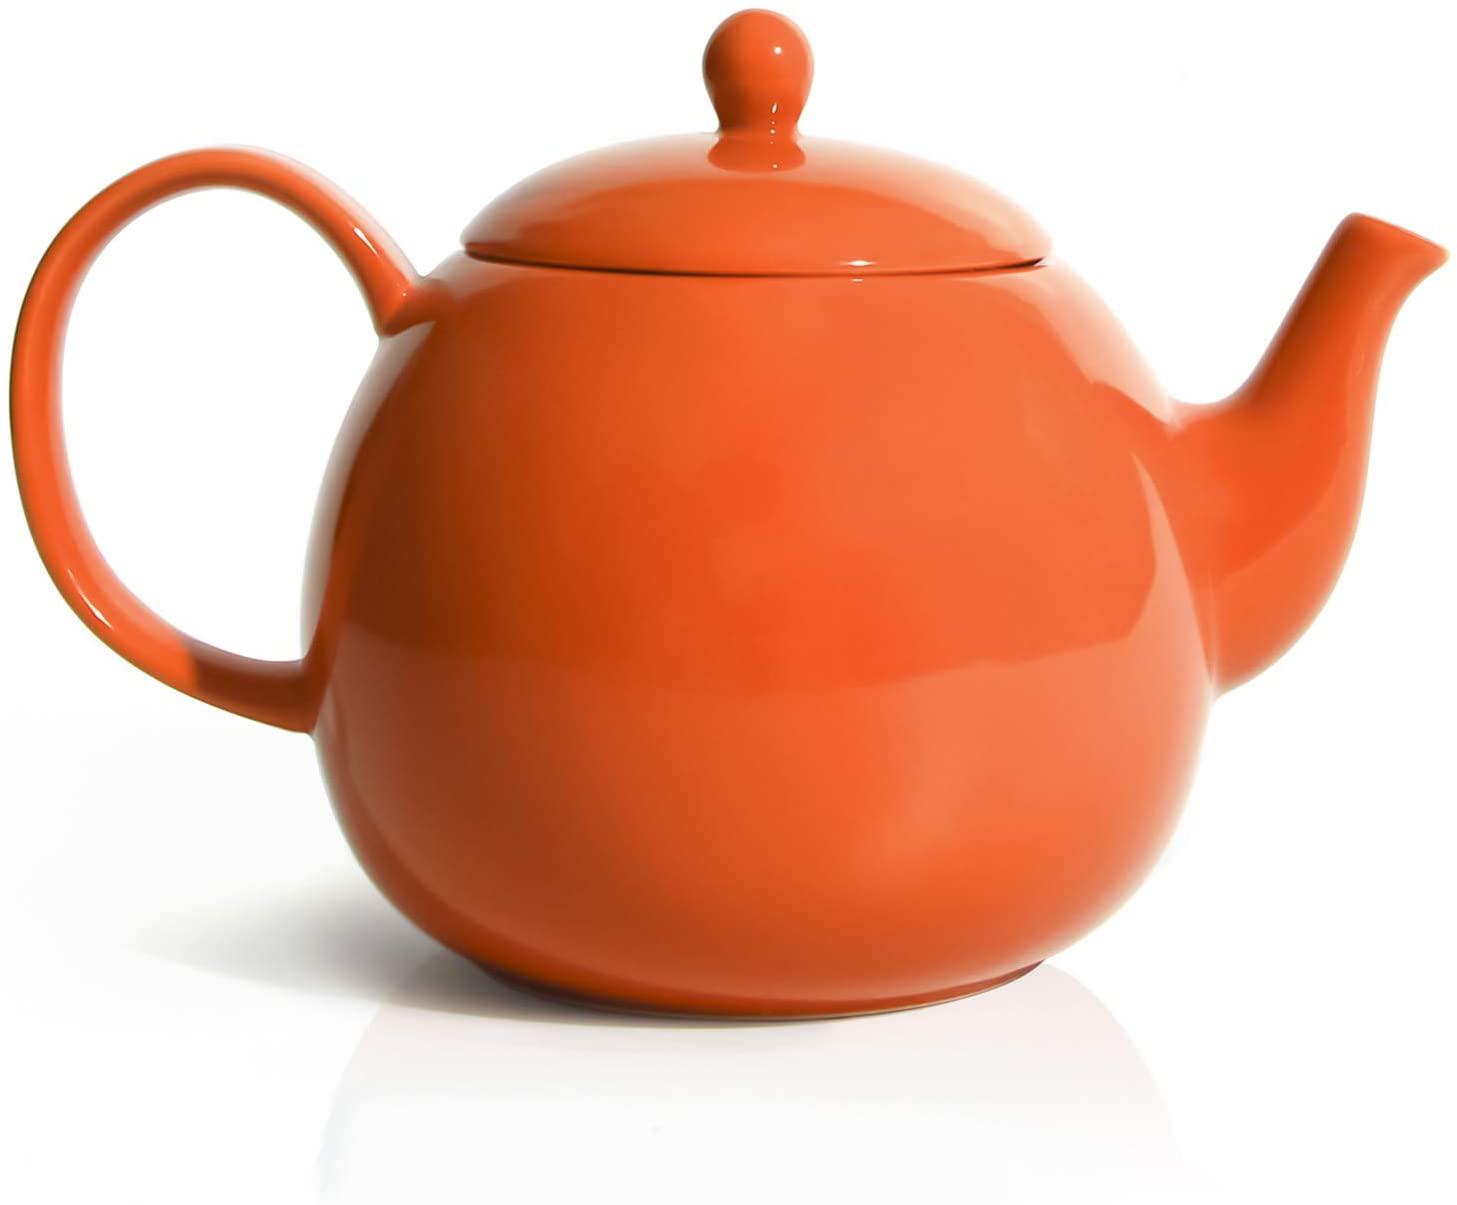 Sweese 220.106 Porcelain Teapot, 40 Ounce Tea Pot - Large Enough for 5 Cups, Orange